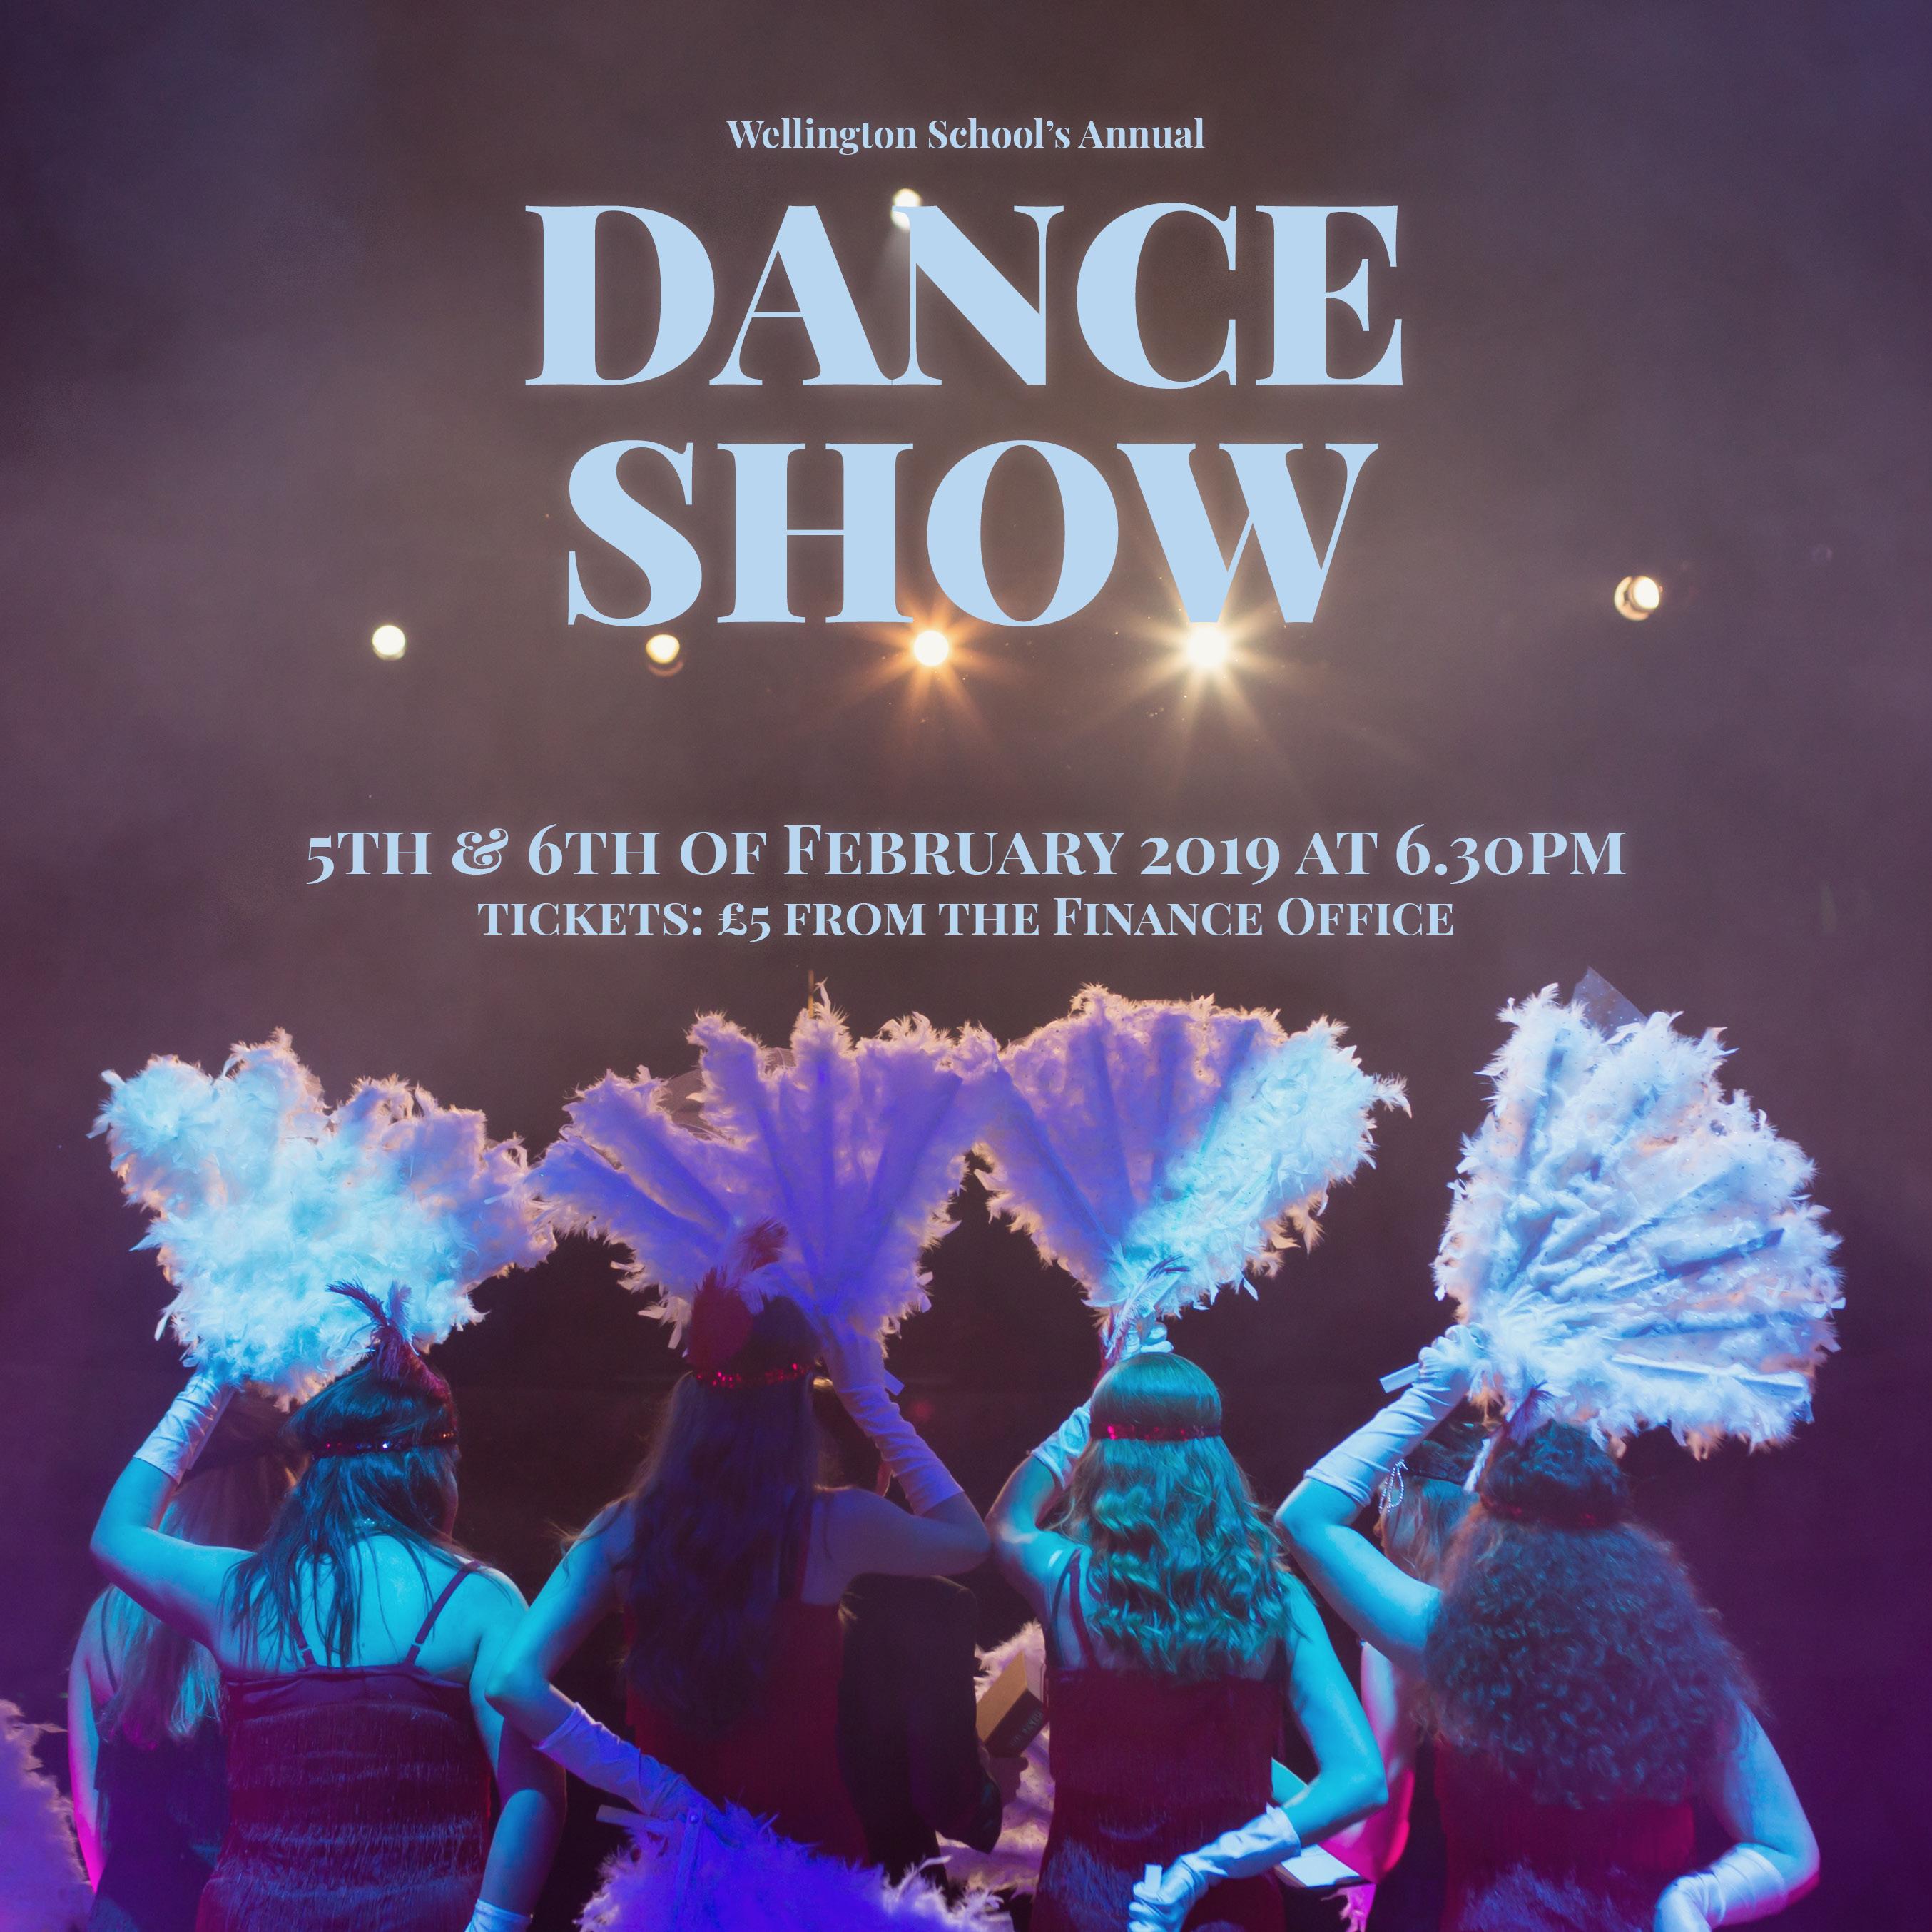 dance-show-2019-advert-web